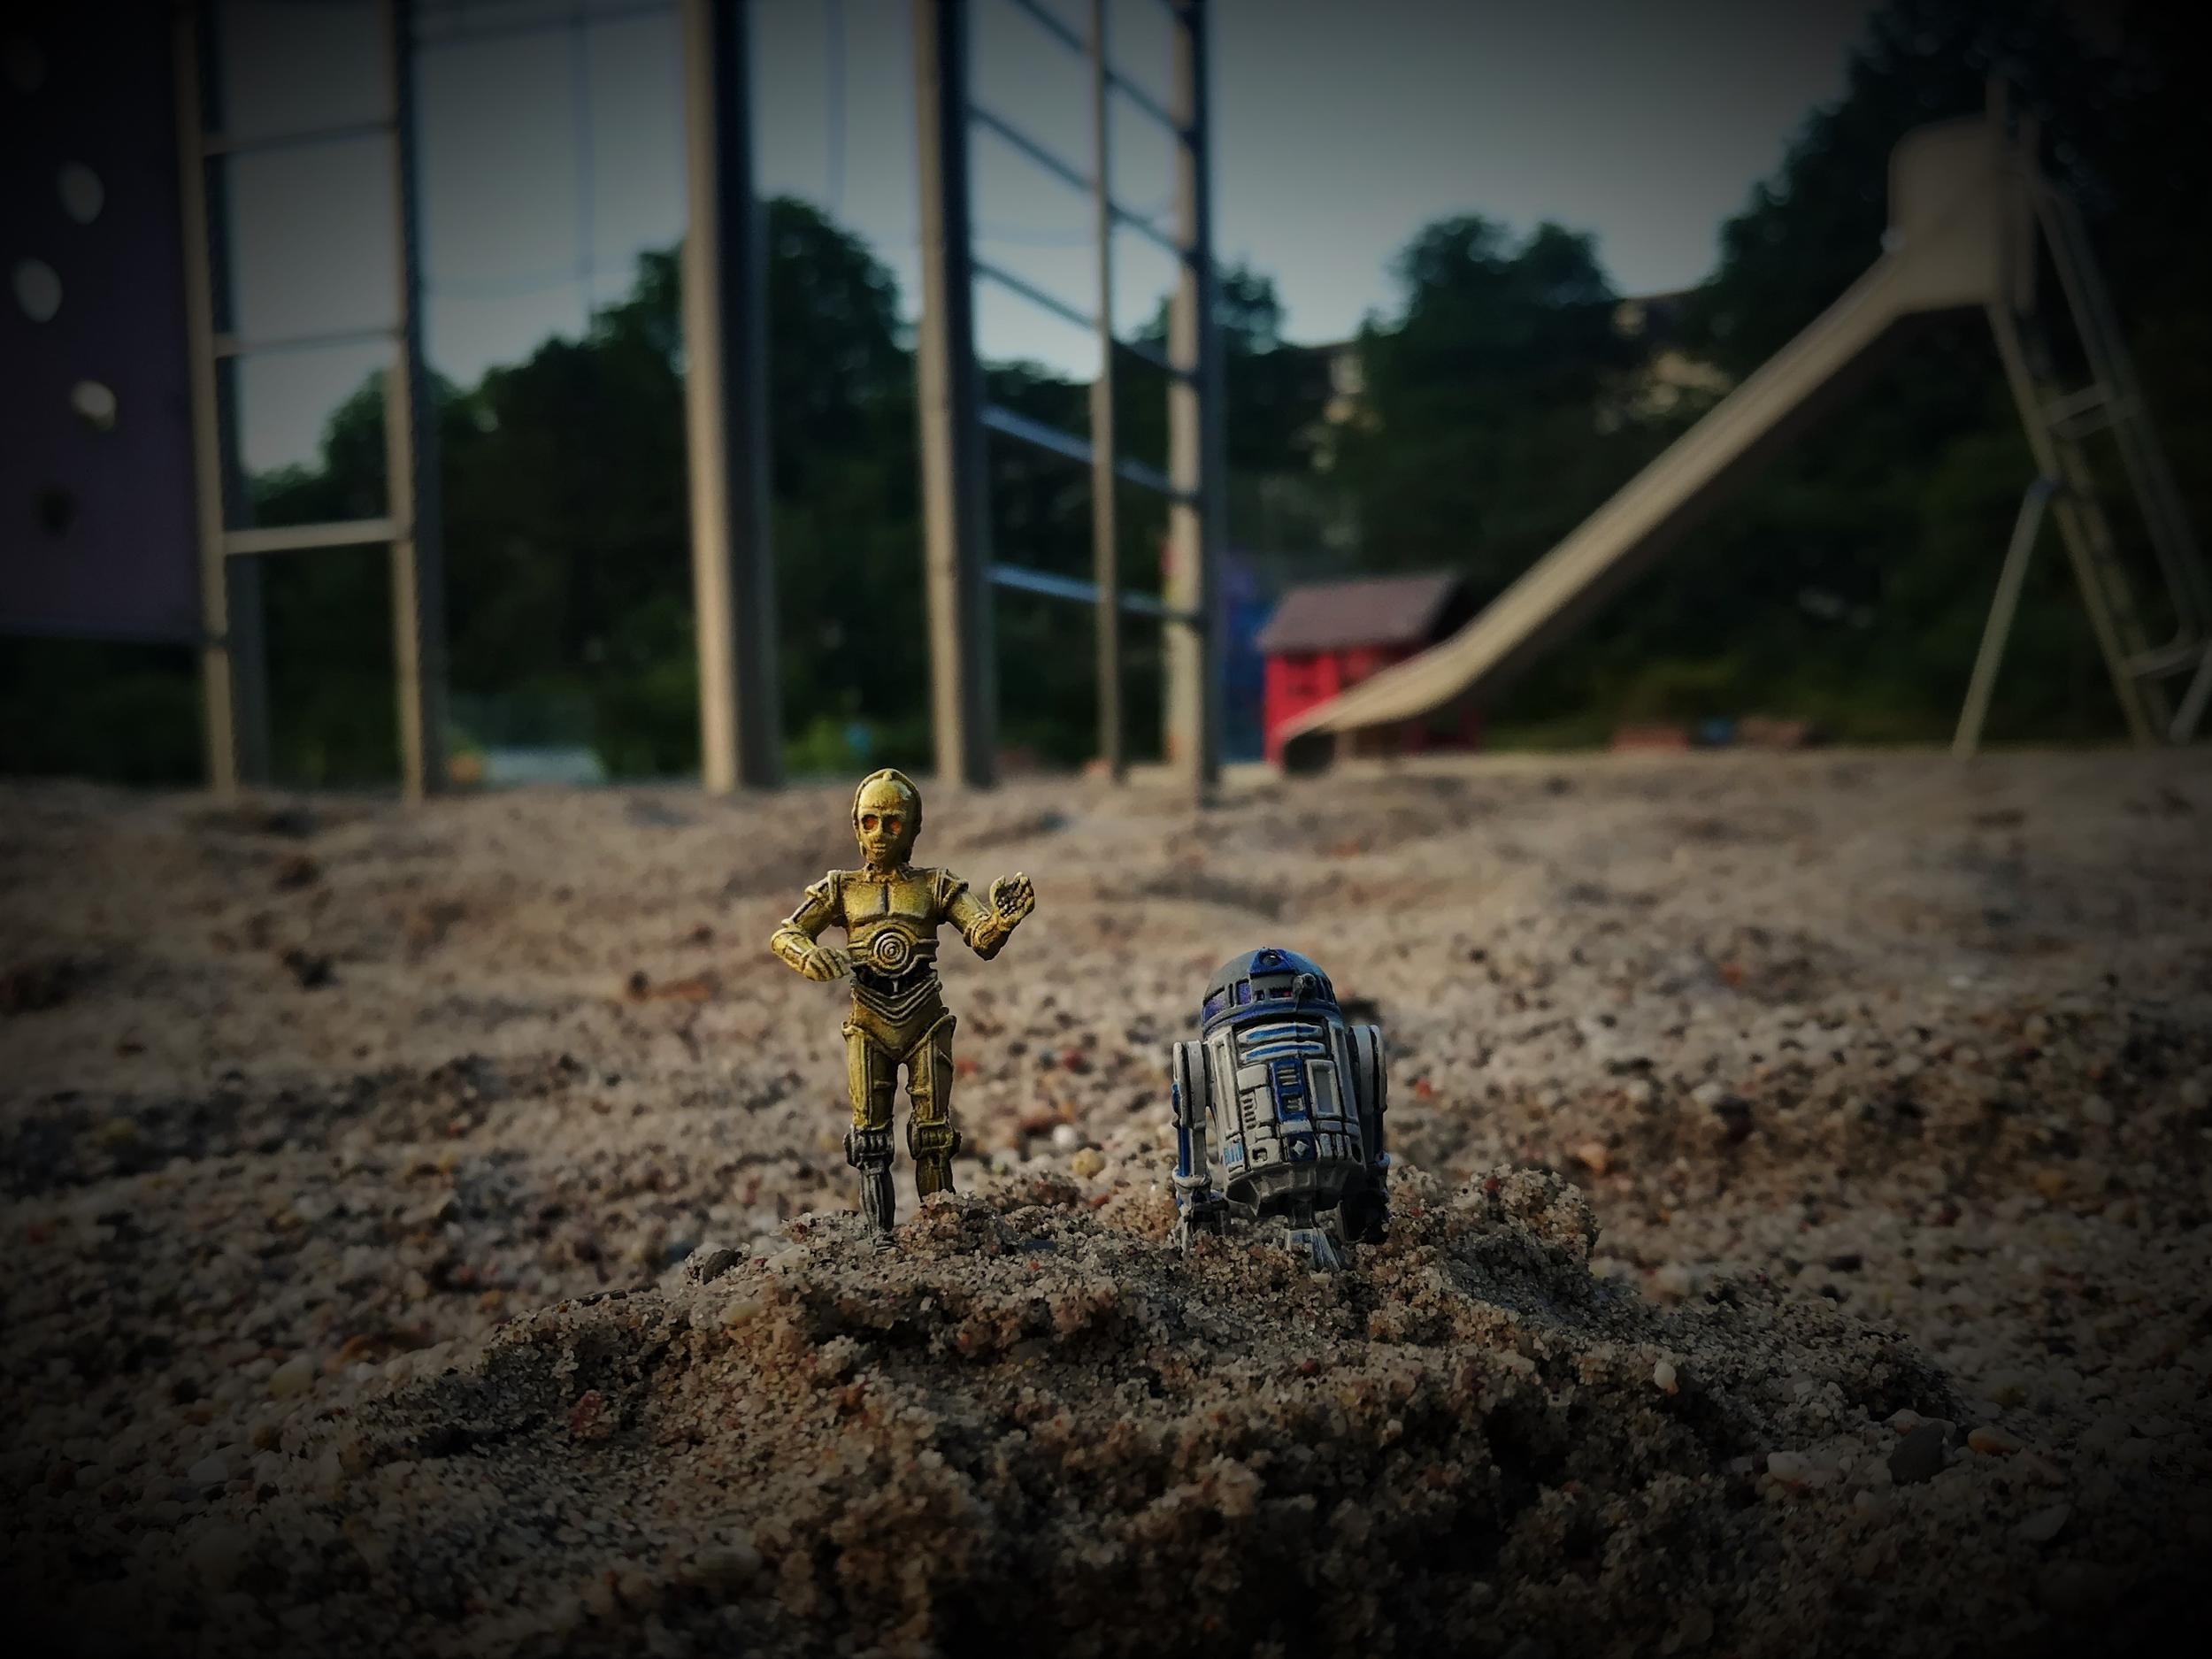 C3PO-R2D2-Sand.jpg.b3650cd58b215526f7c54ea2b7074267.jpg